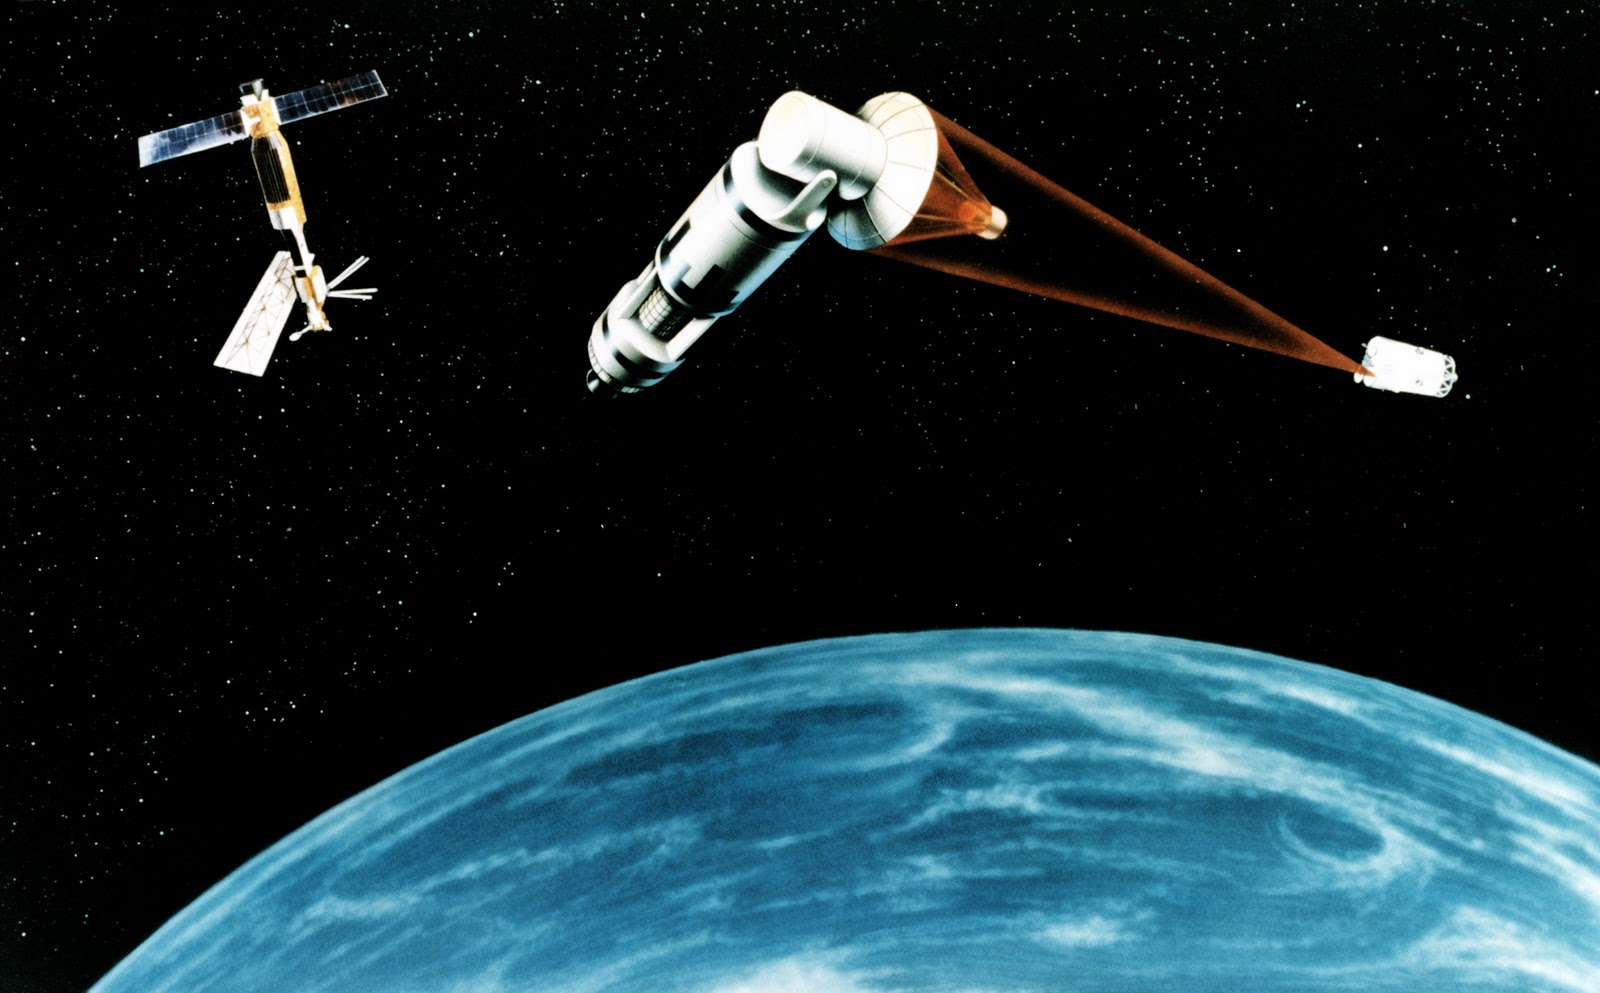 satellite and spacecraft - photo #22